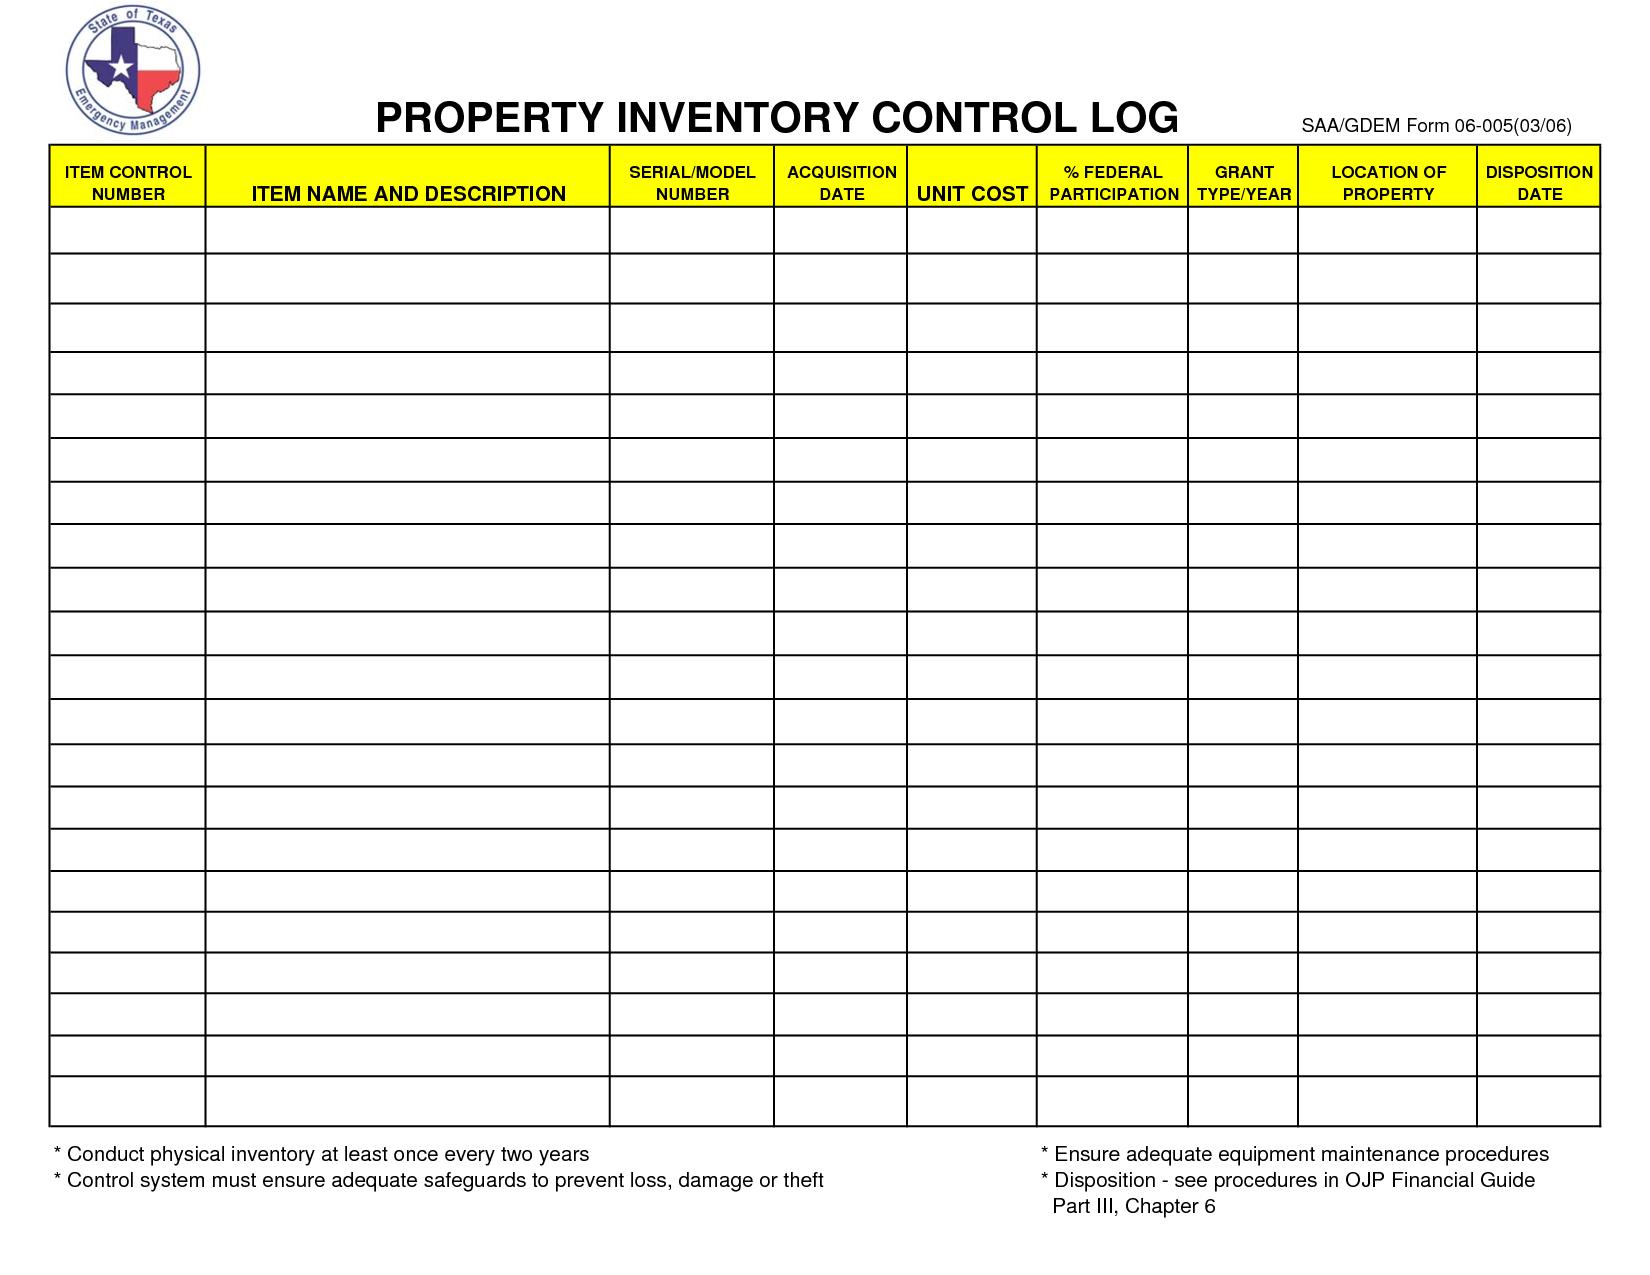 Inventory Control Form Template — db-excel.com